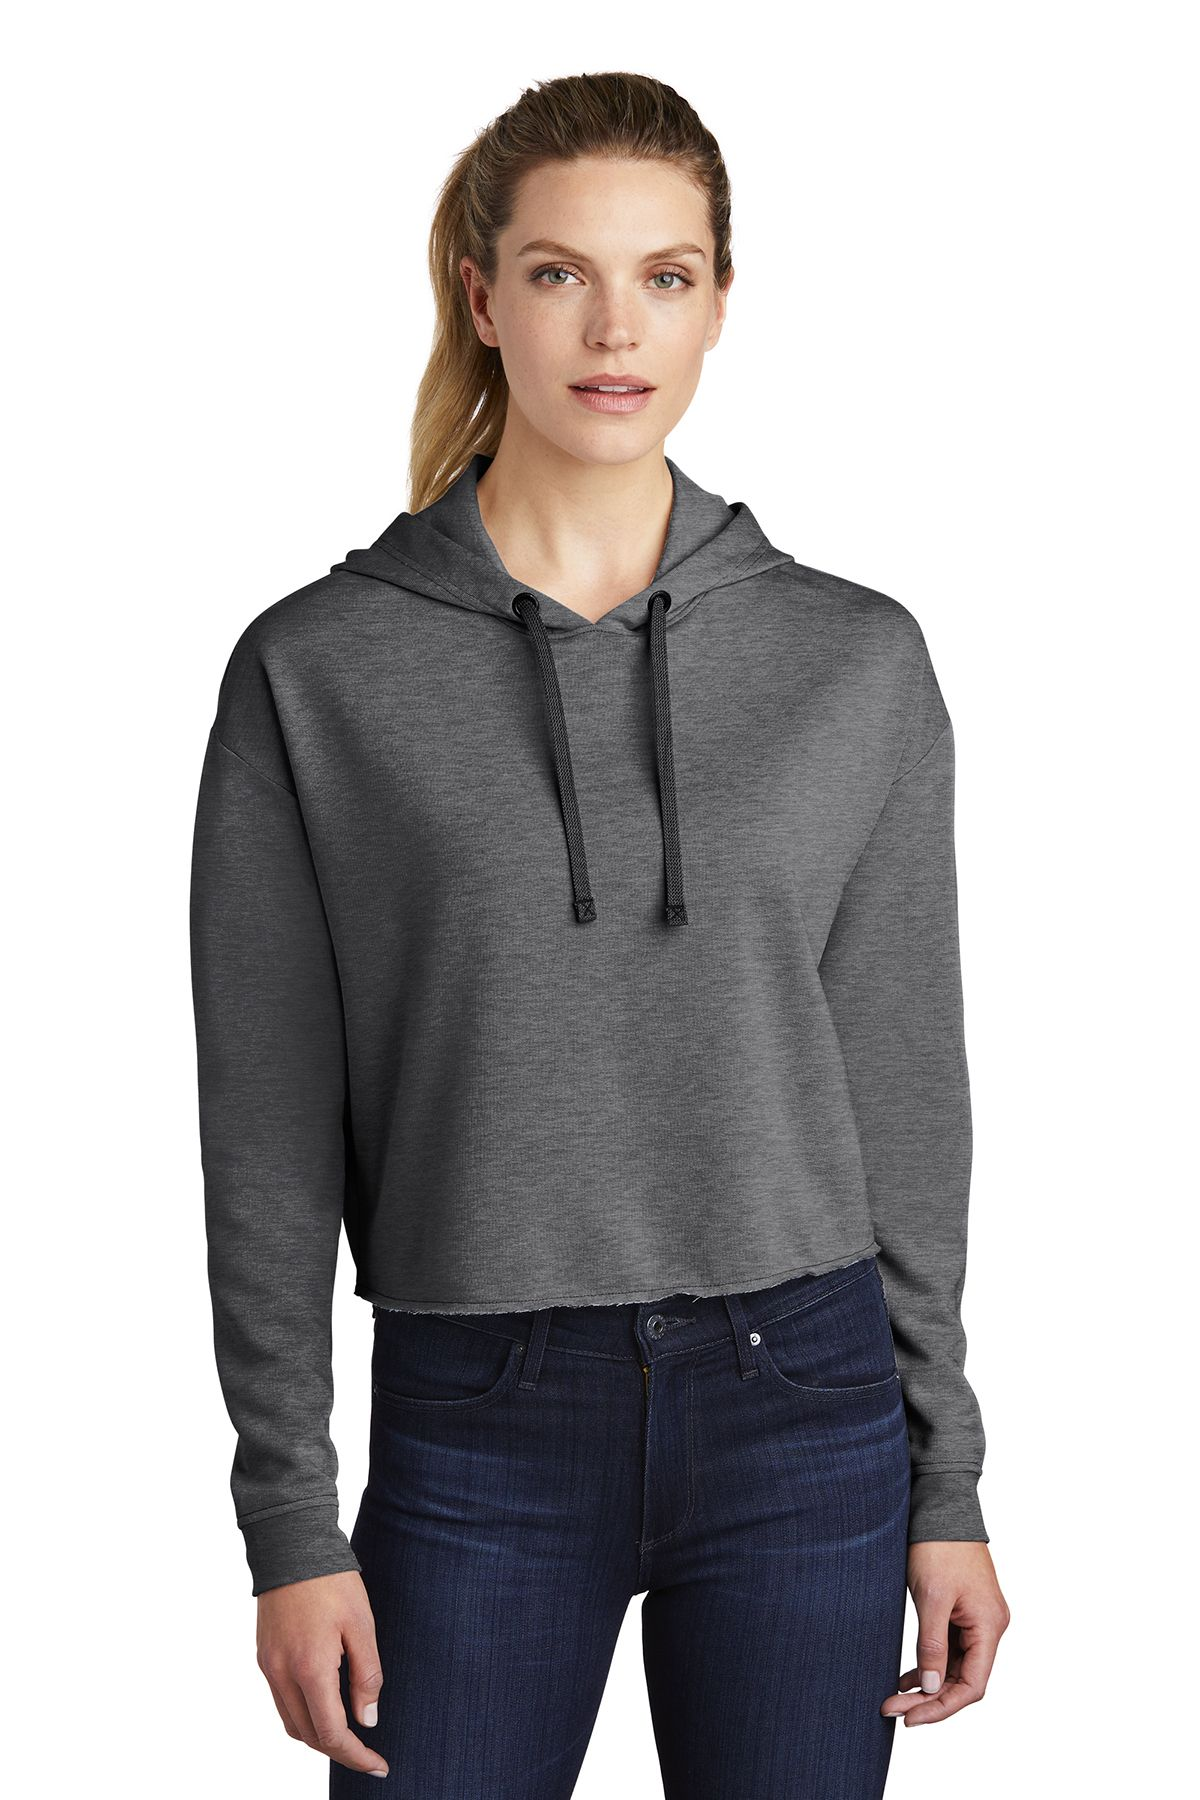 SportTek ® Ladies PosiCharge ® TriBlend Wicking Fleece